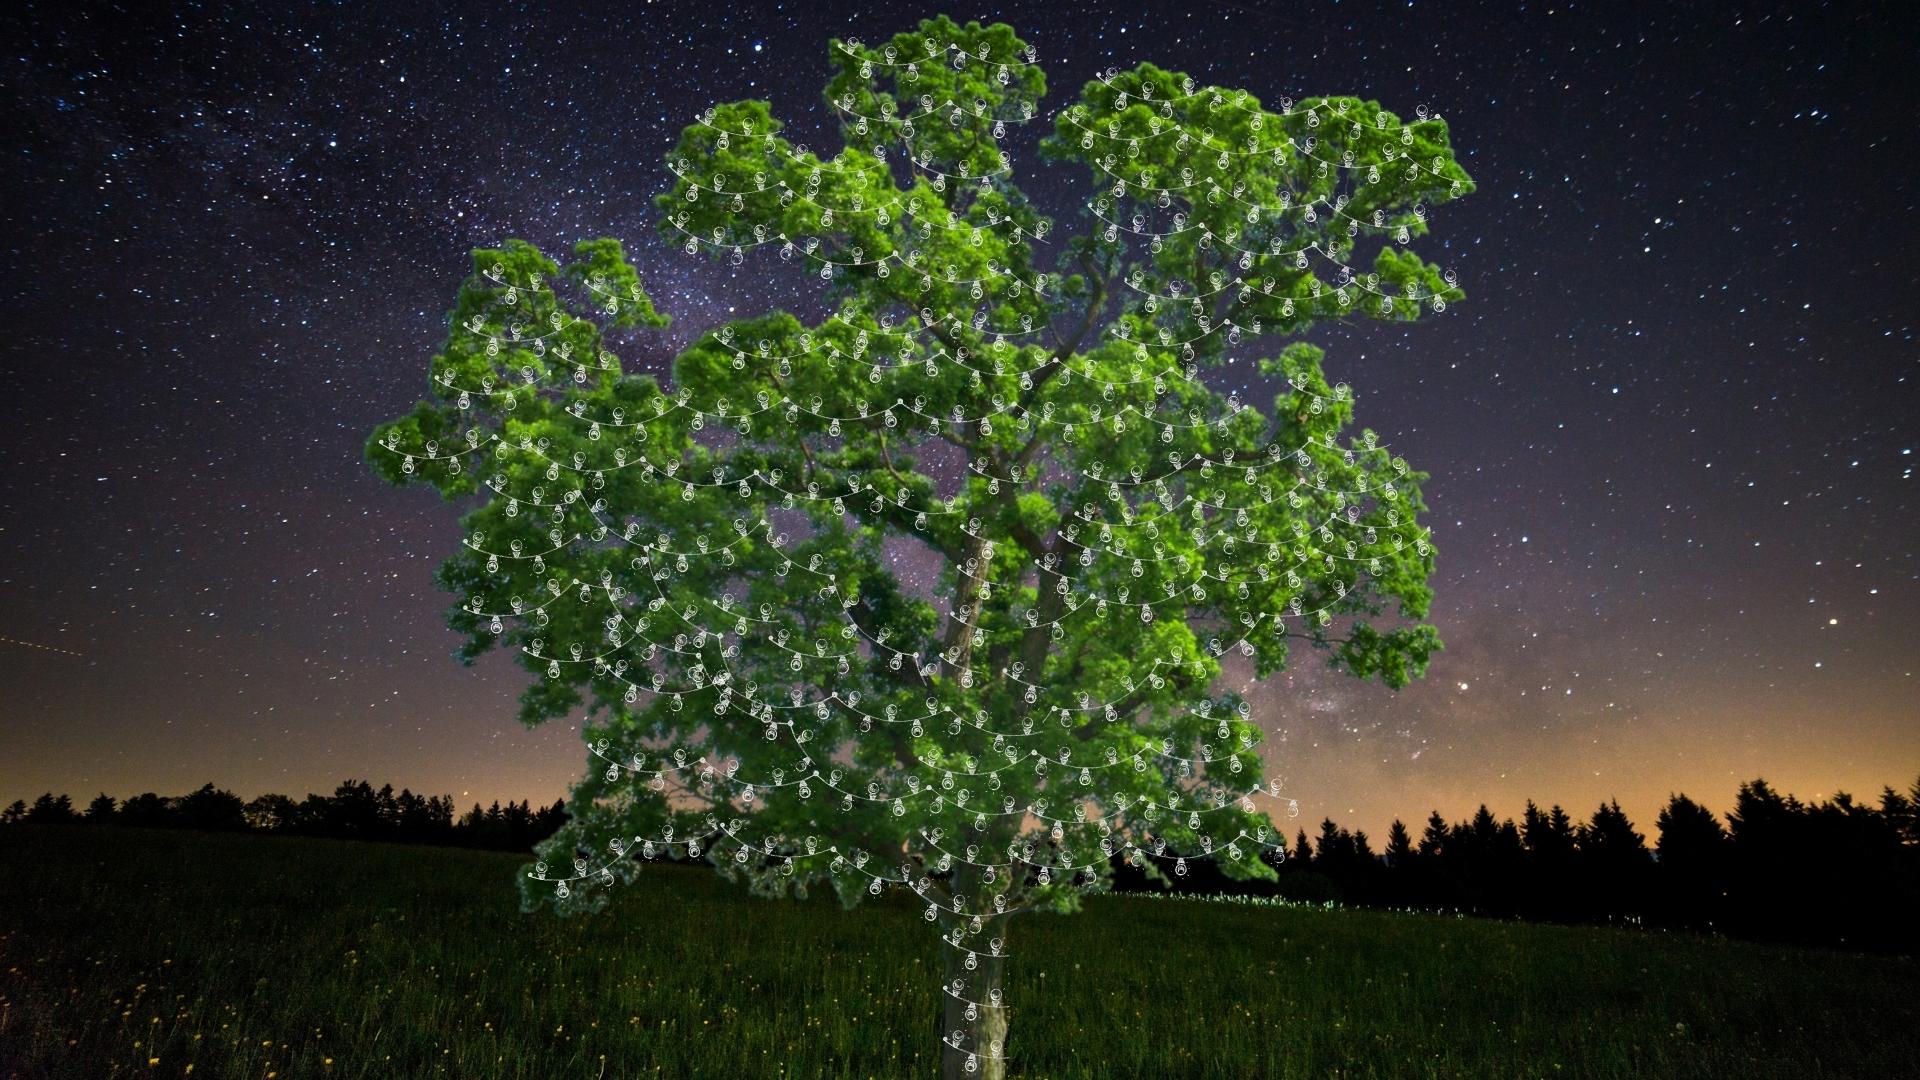 Tree with lights